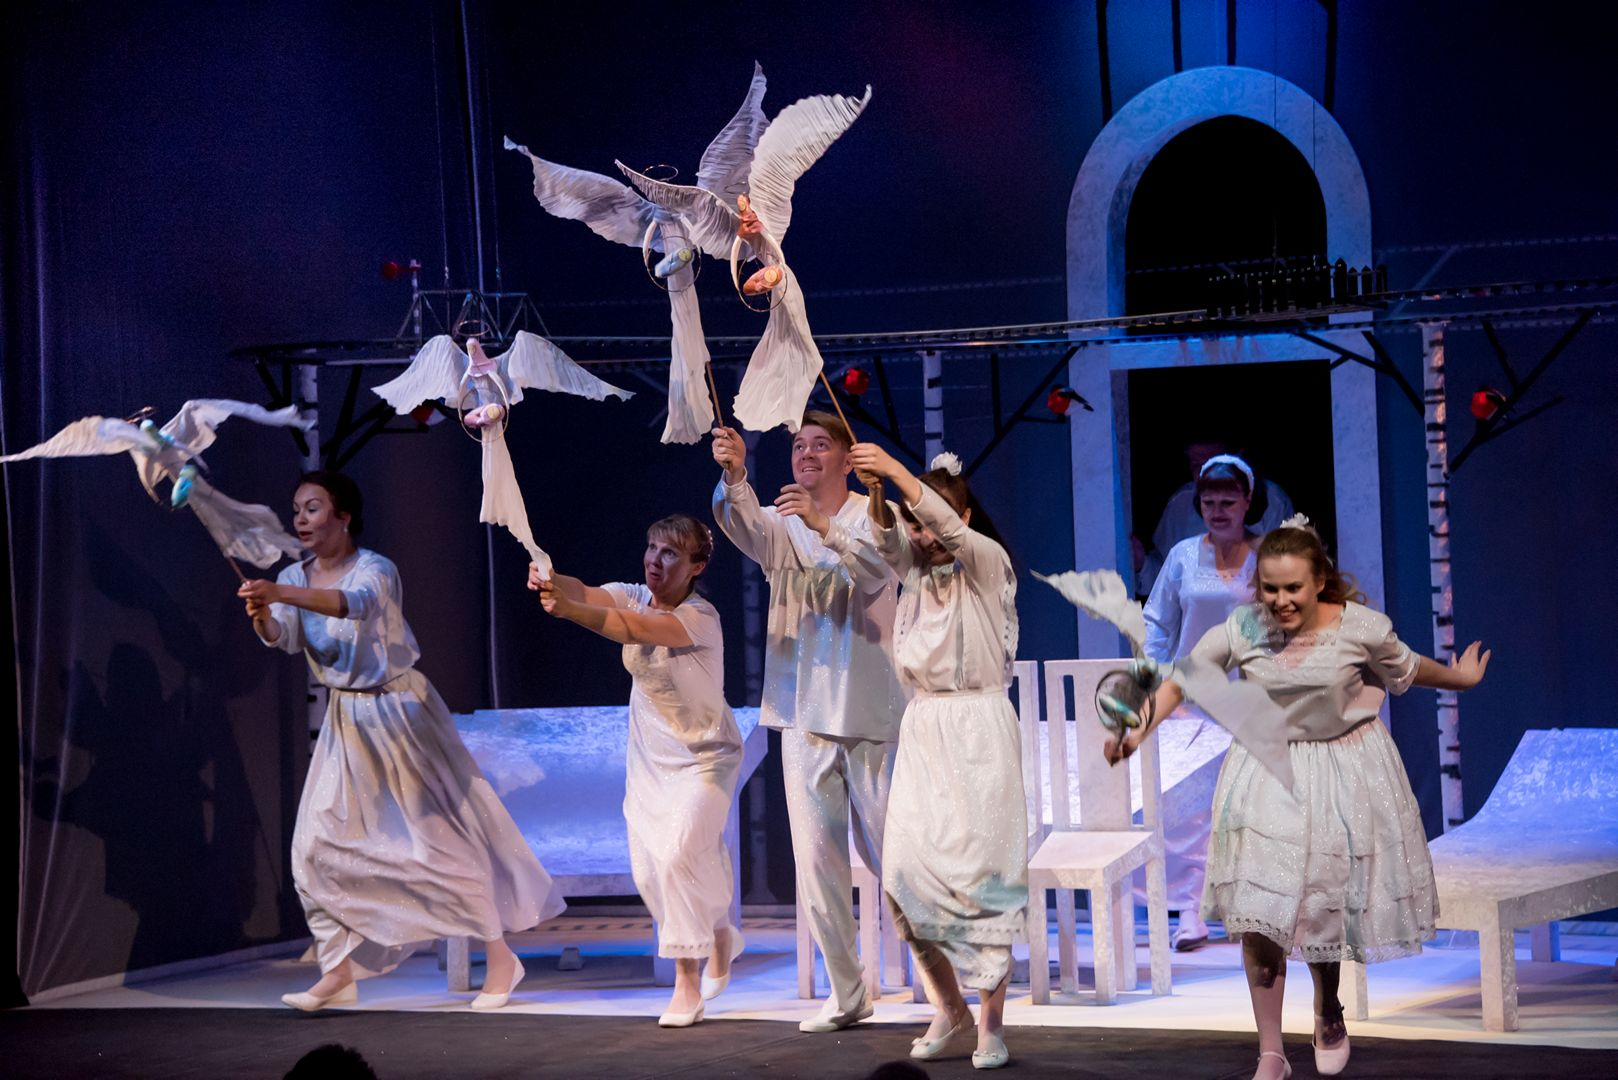 Телеканал «Театр» покажет спектакль челябинского театра кукол